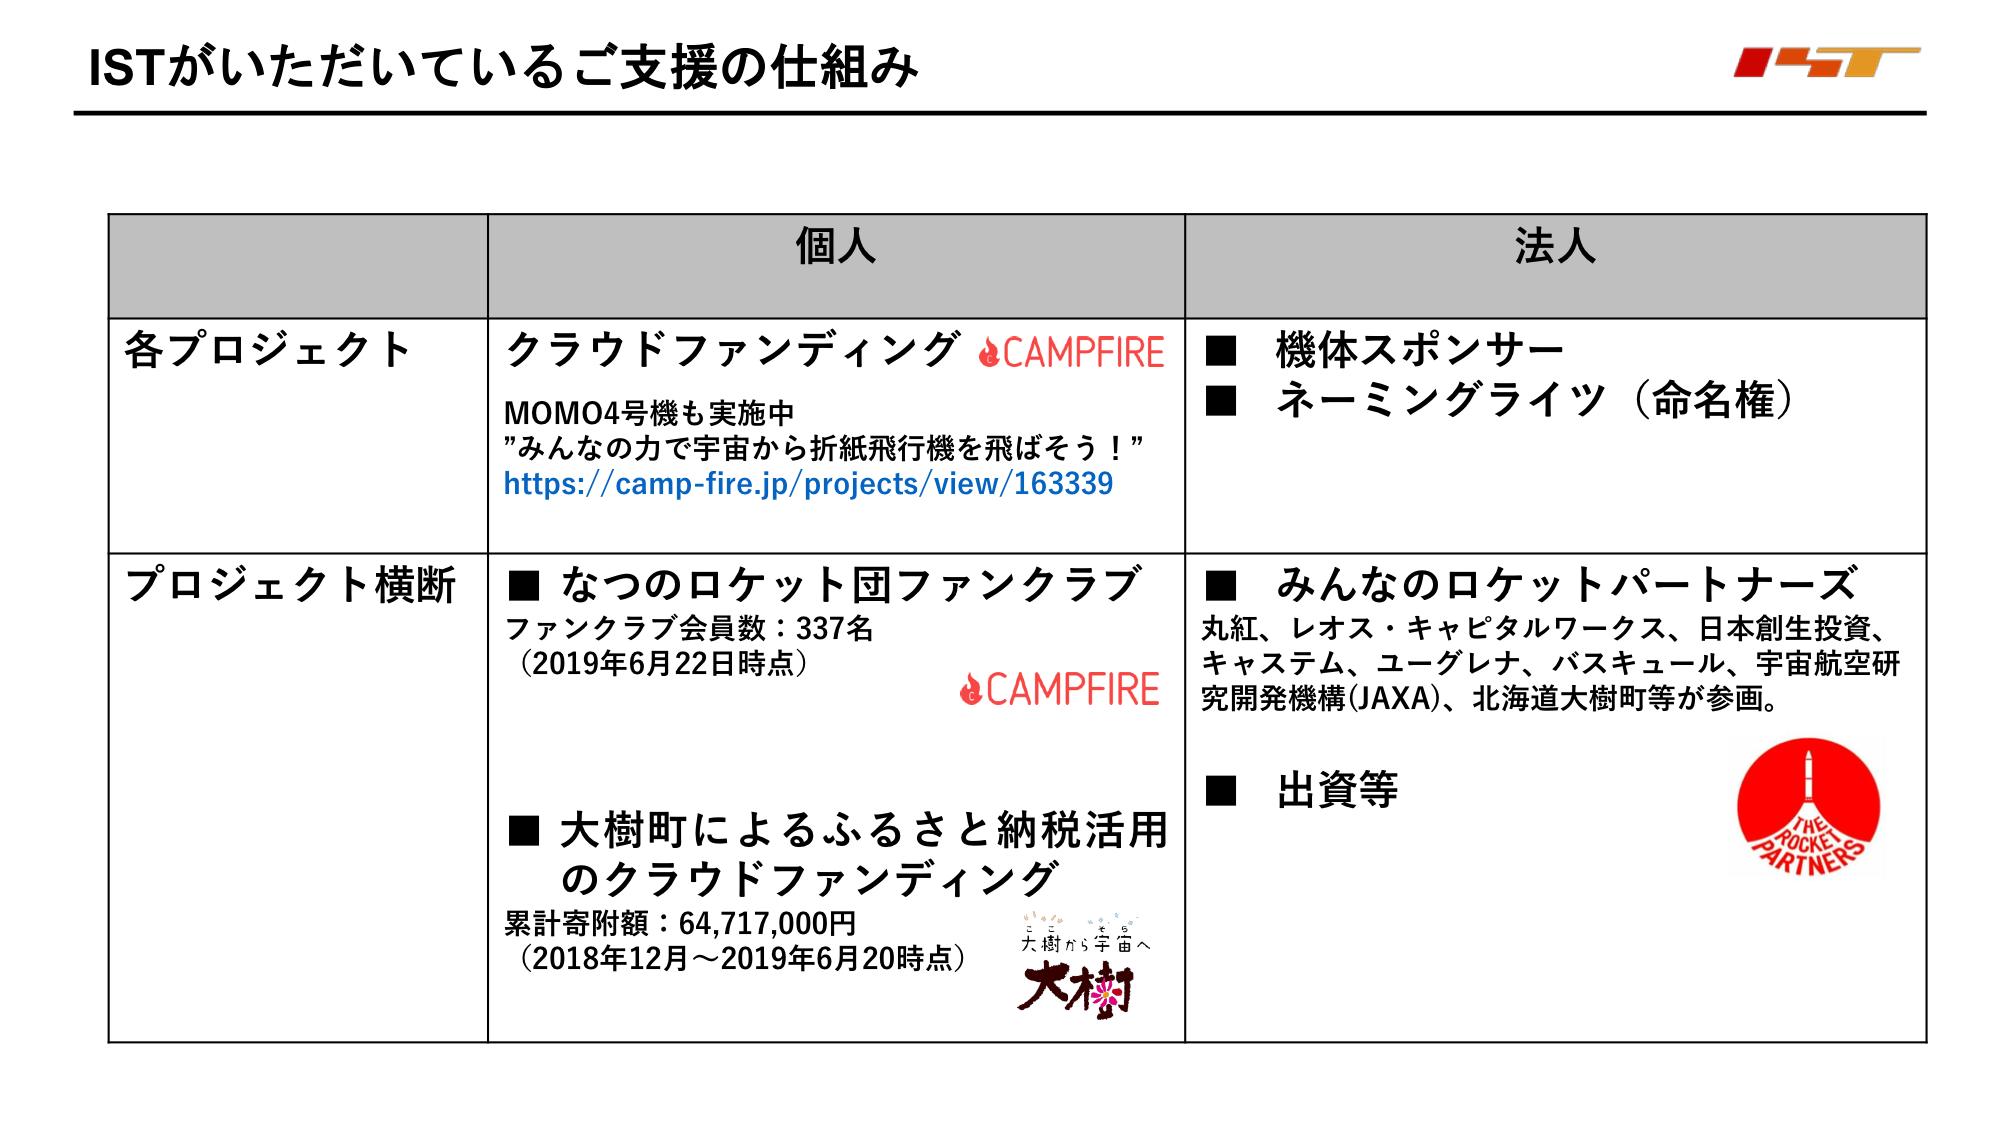 f:id:Imamura:20190628161429p:plain